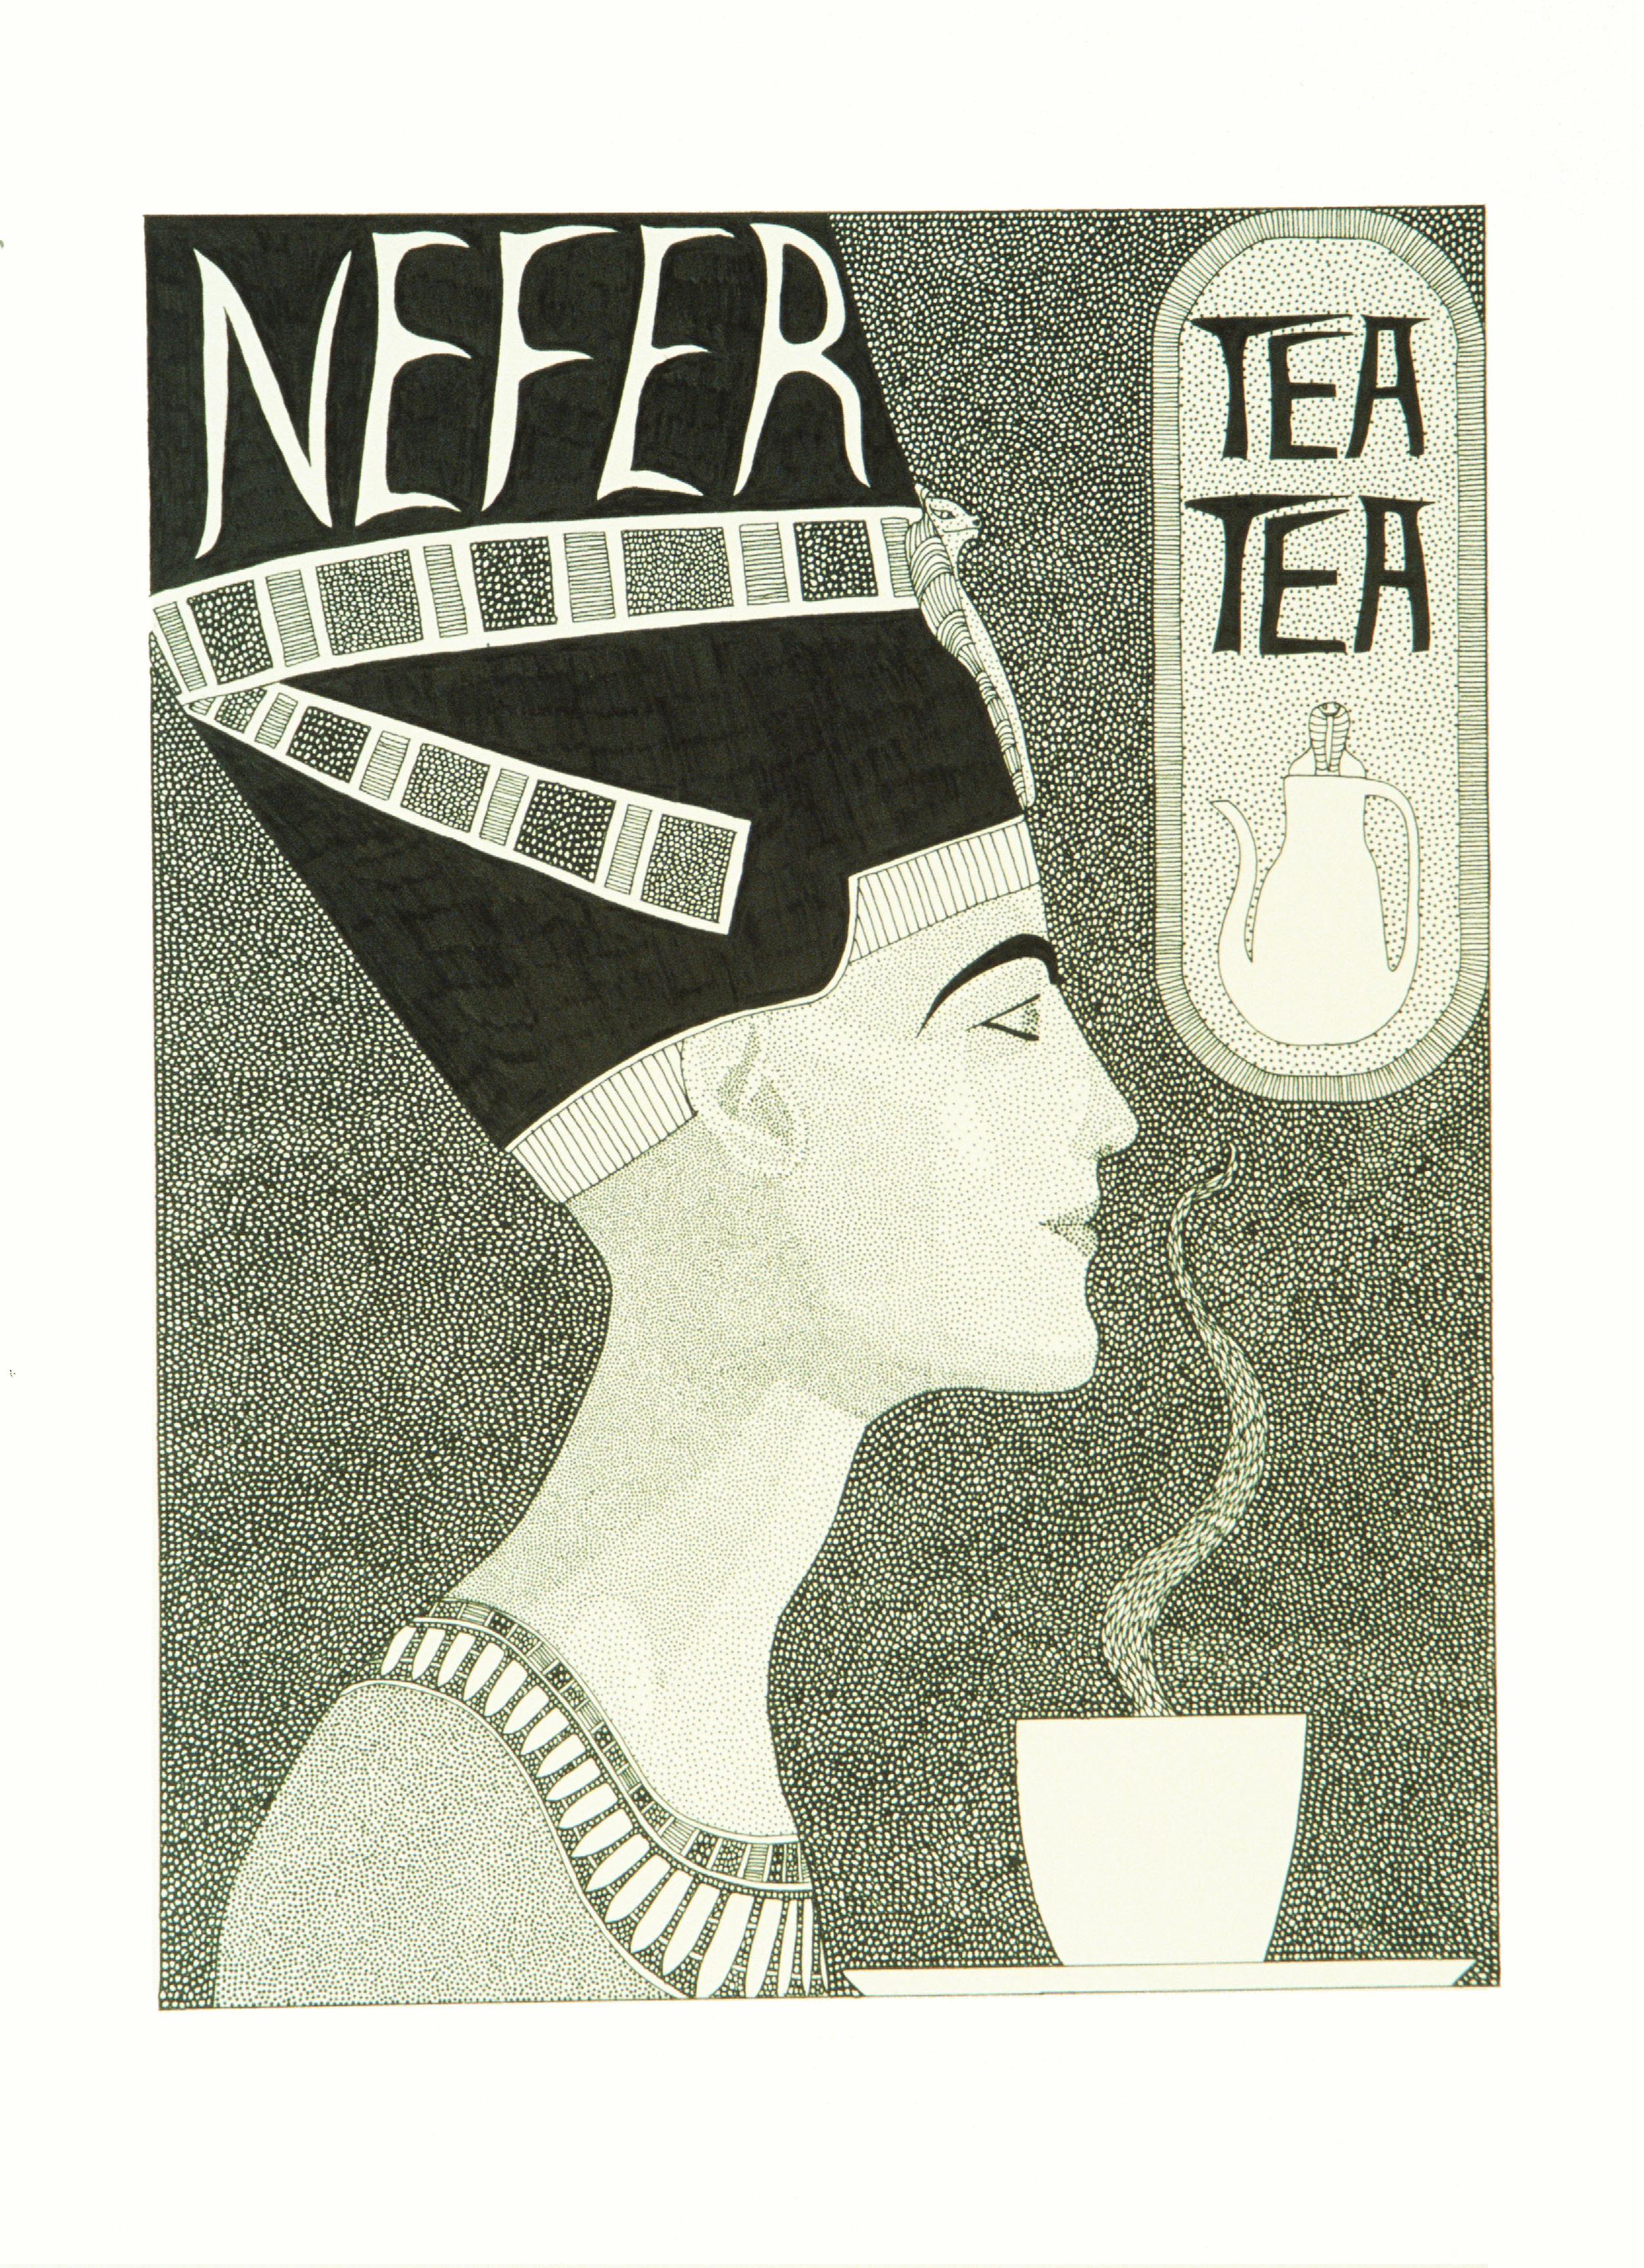 Nefer Tea Tea